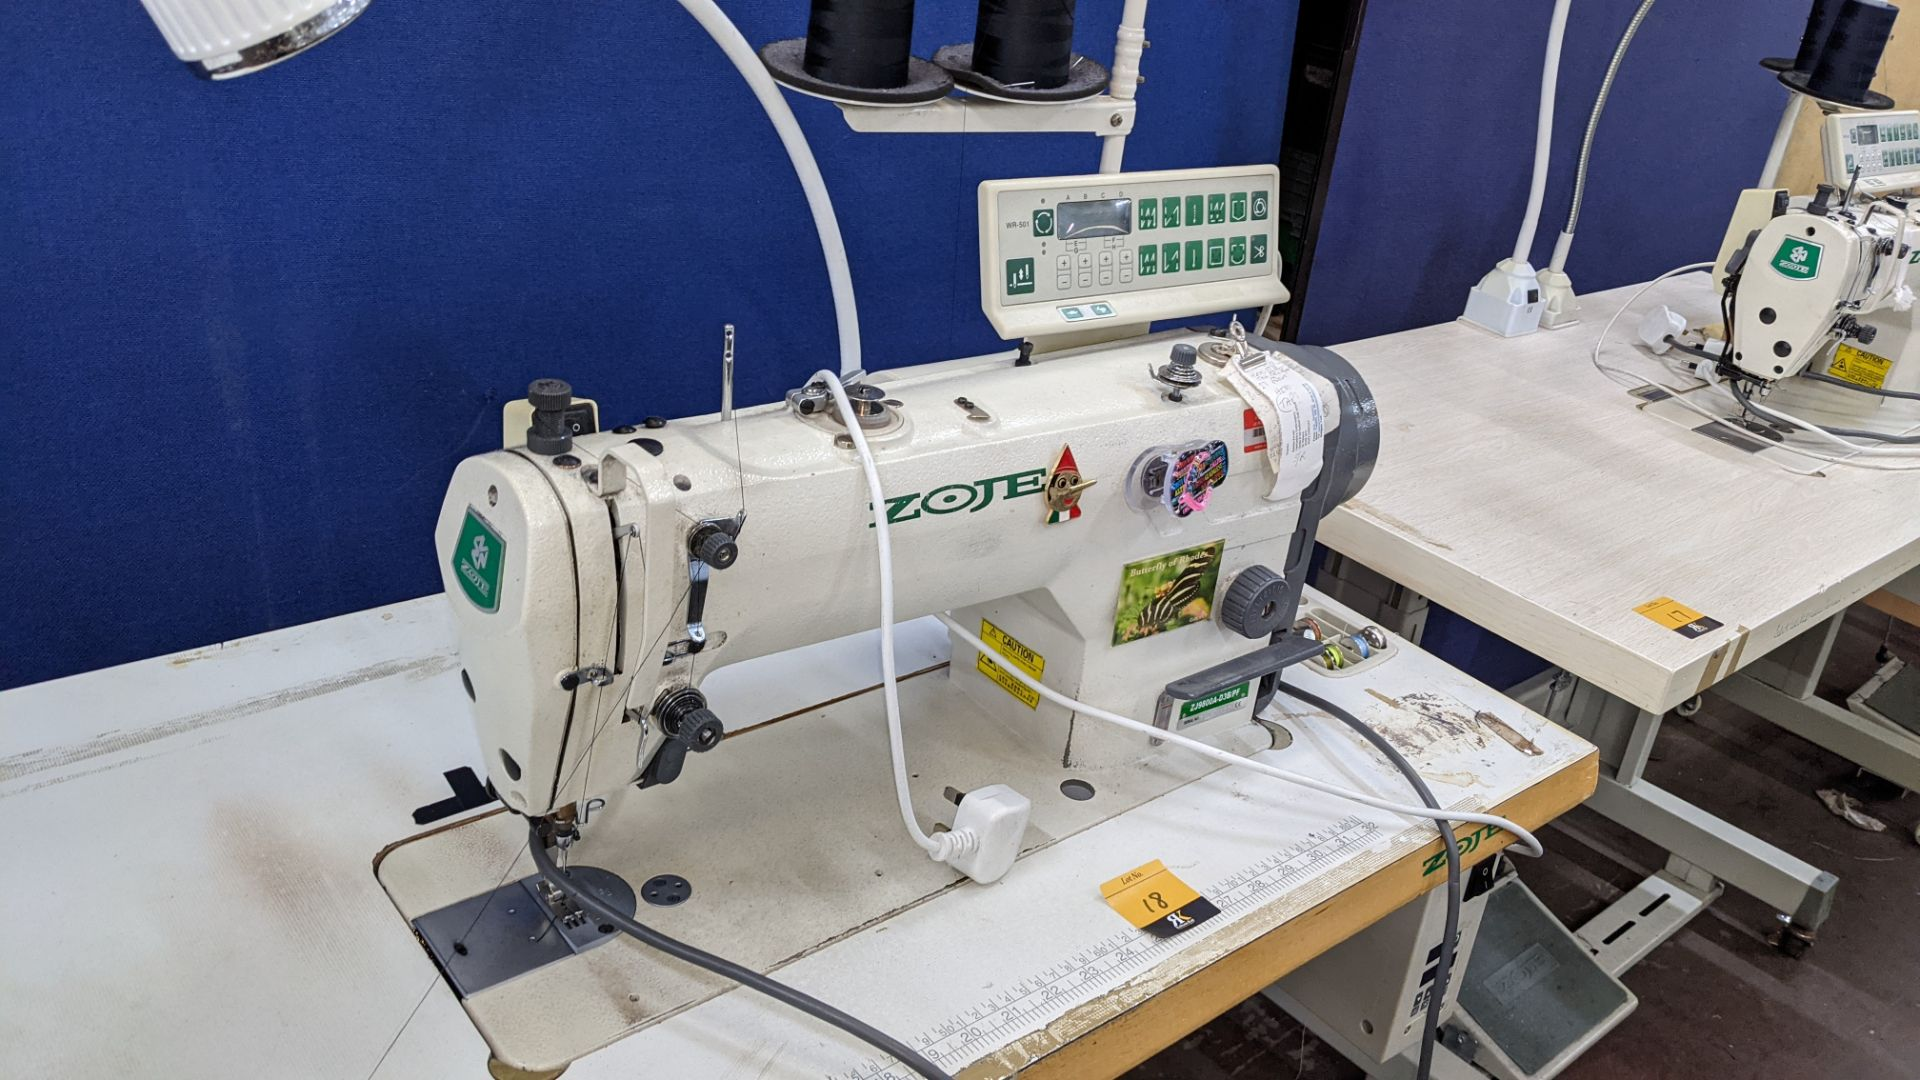 Zoje model ZJ9800A-D3B/PF lockstitch sewing machine with model WR-501 digital controller - Image 7 of 20